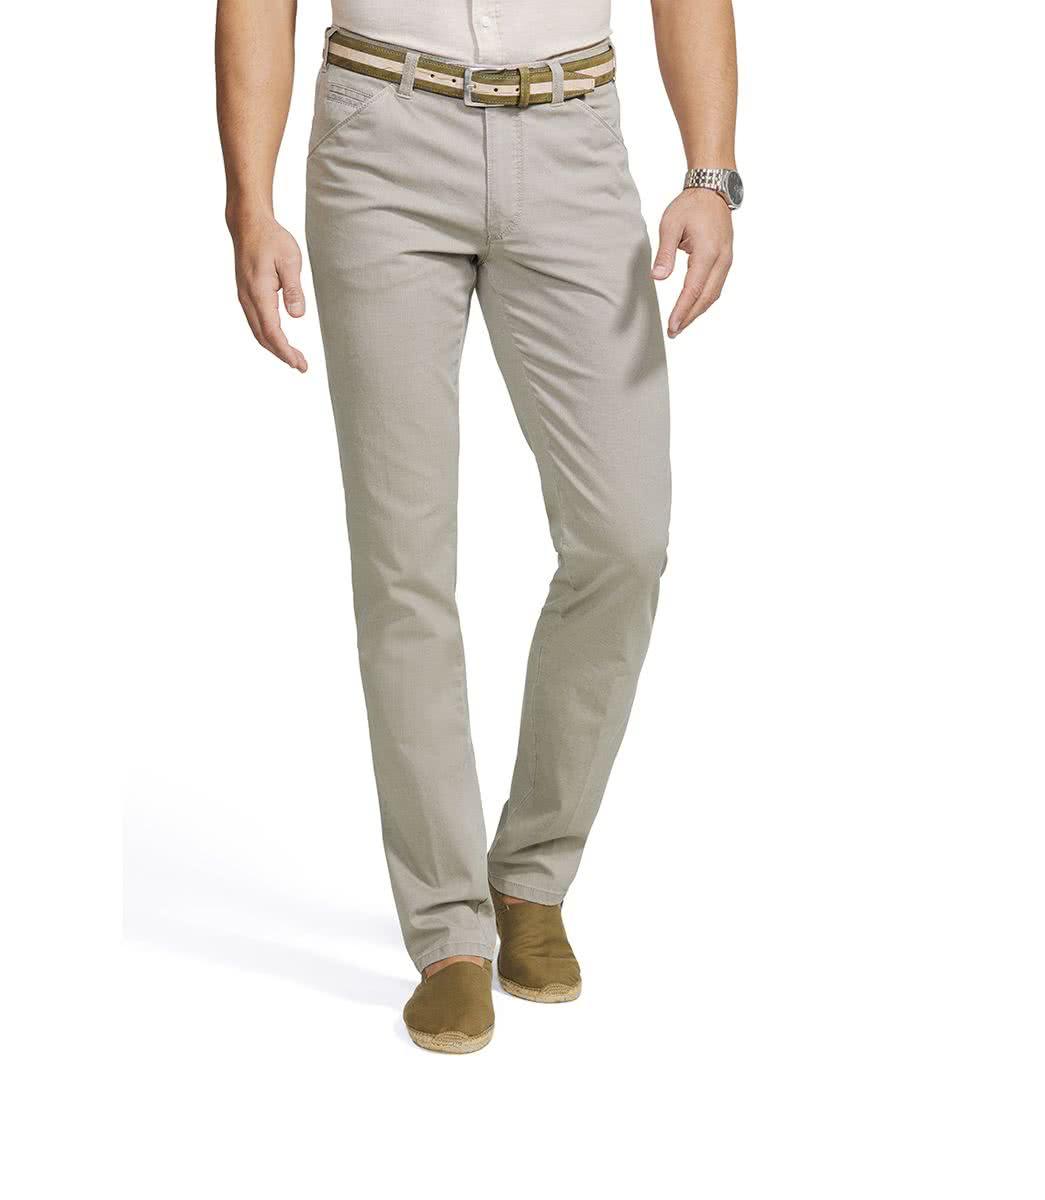 Meyer Canvas beige trousers